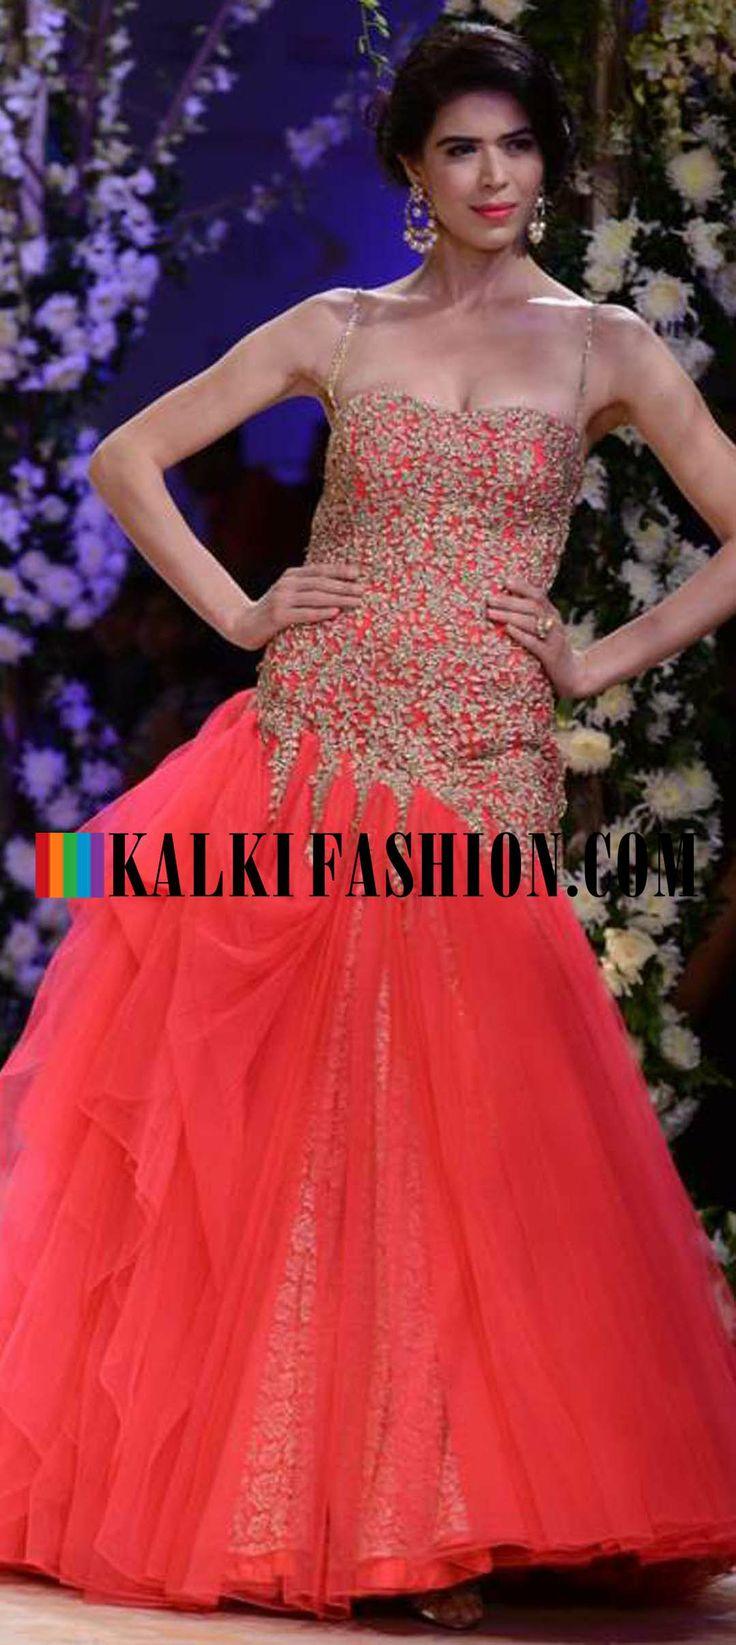 http://www.kalkifashion.com/designers/jyotsna-tiwari.html Urnashi Rautela and other models walk the ramp for Jyotsna Tiwari at Indian Bridal Week NOV 2013 at Mumbai 53